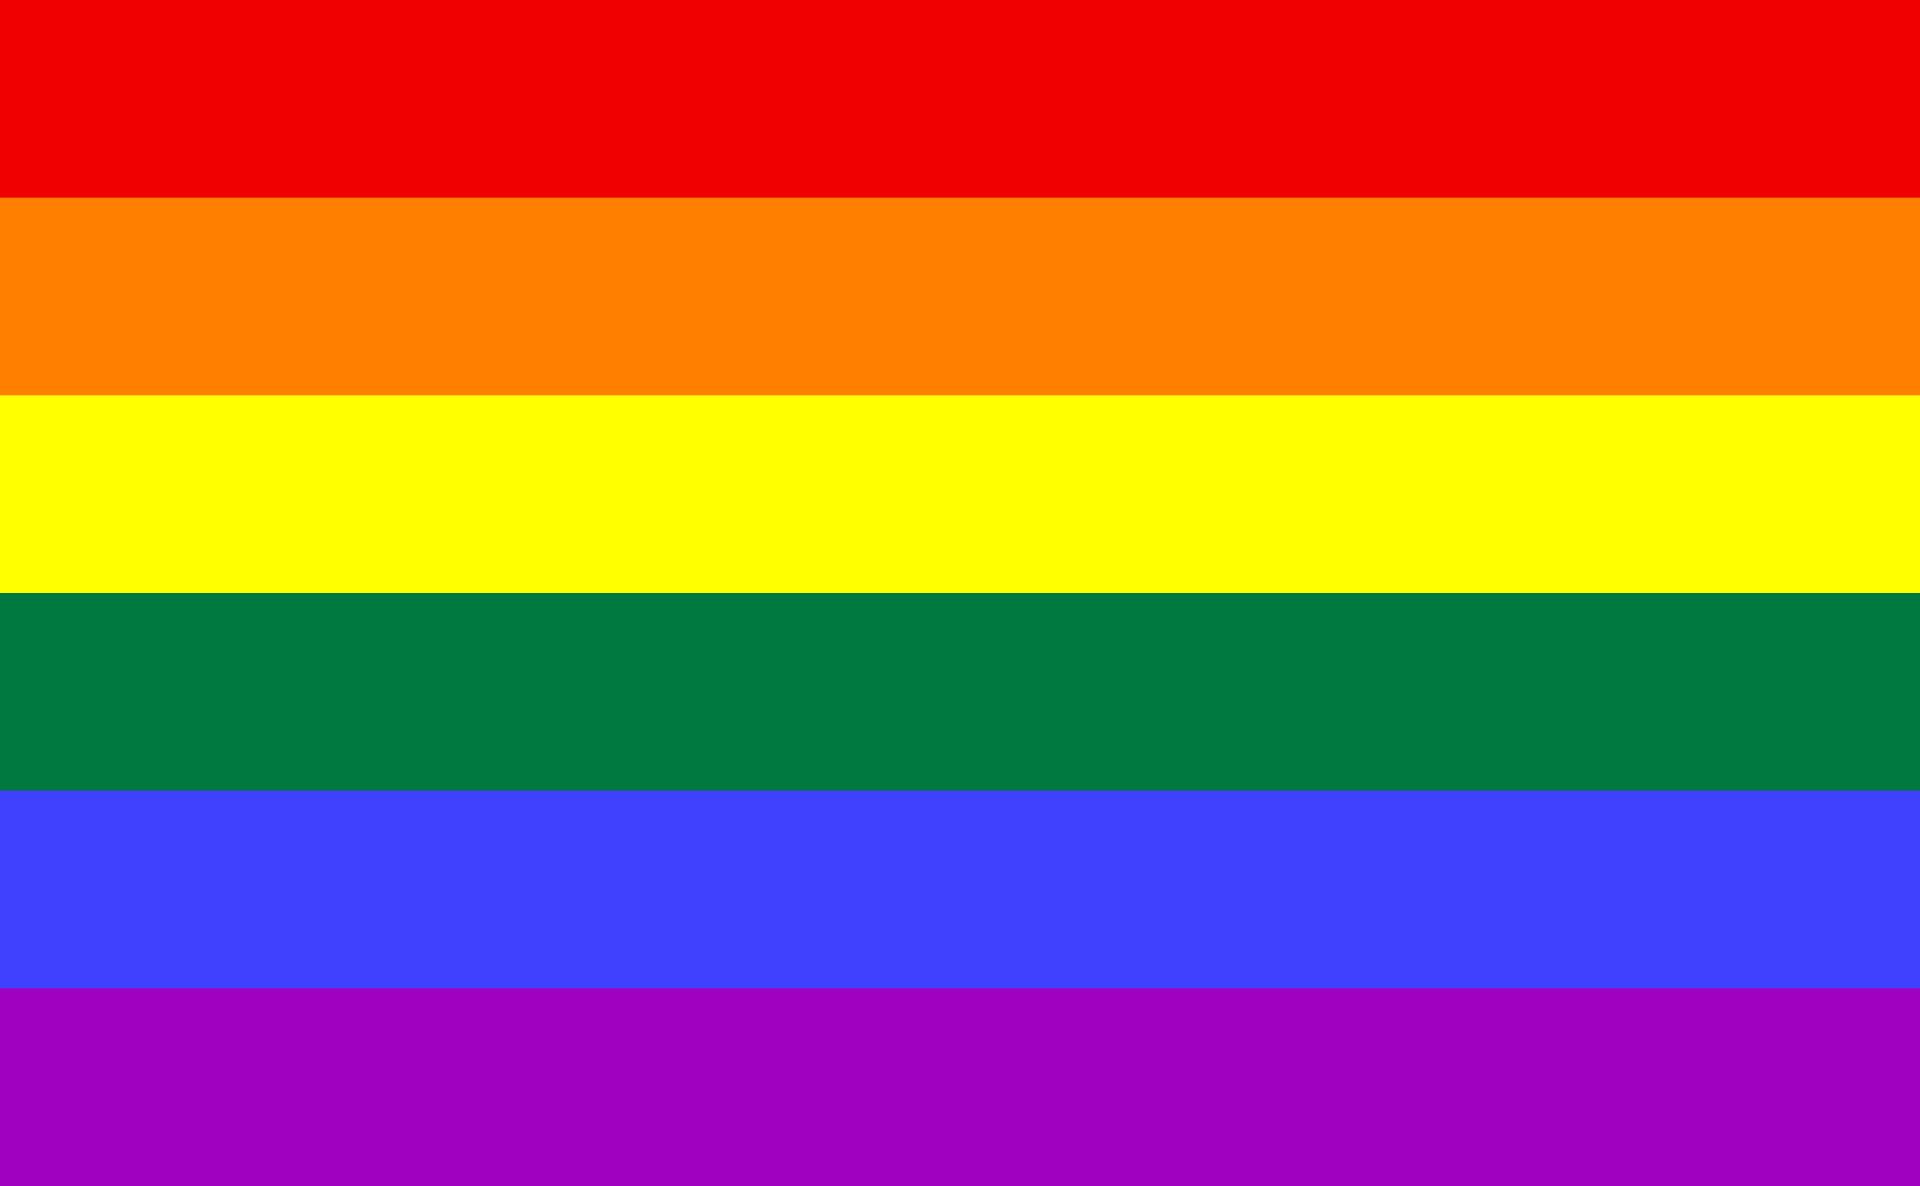 File:LGBT Rainbow Flag.png.